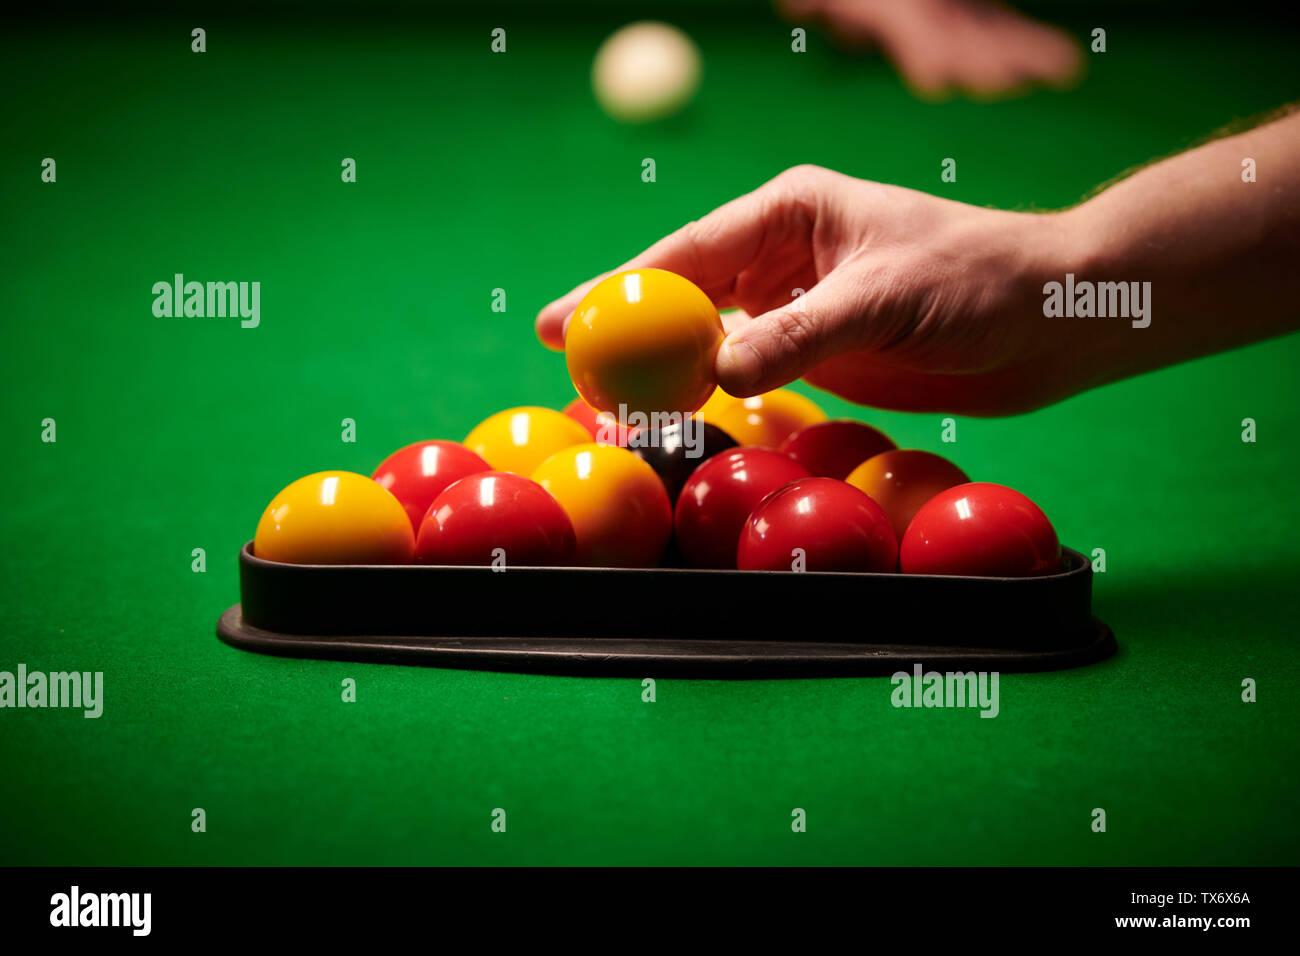 rack them up pool - Stock Image